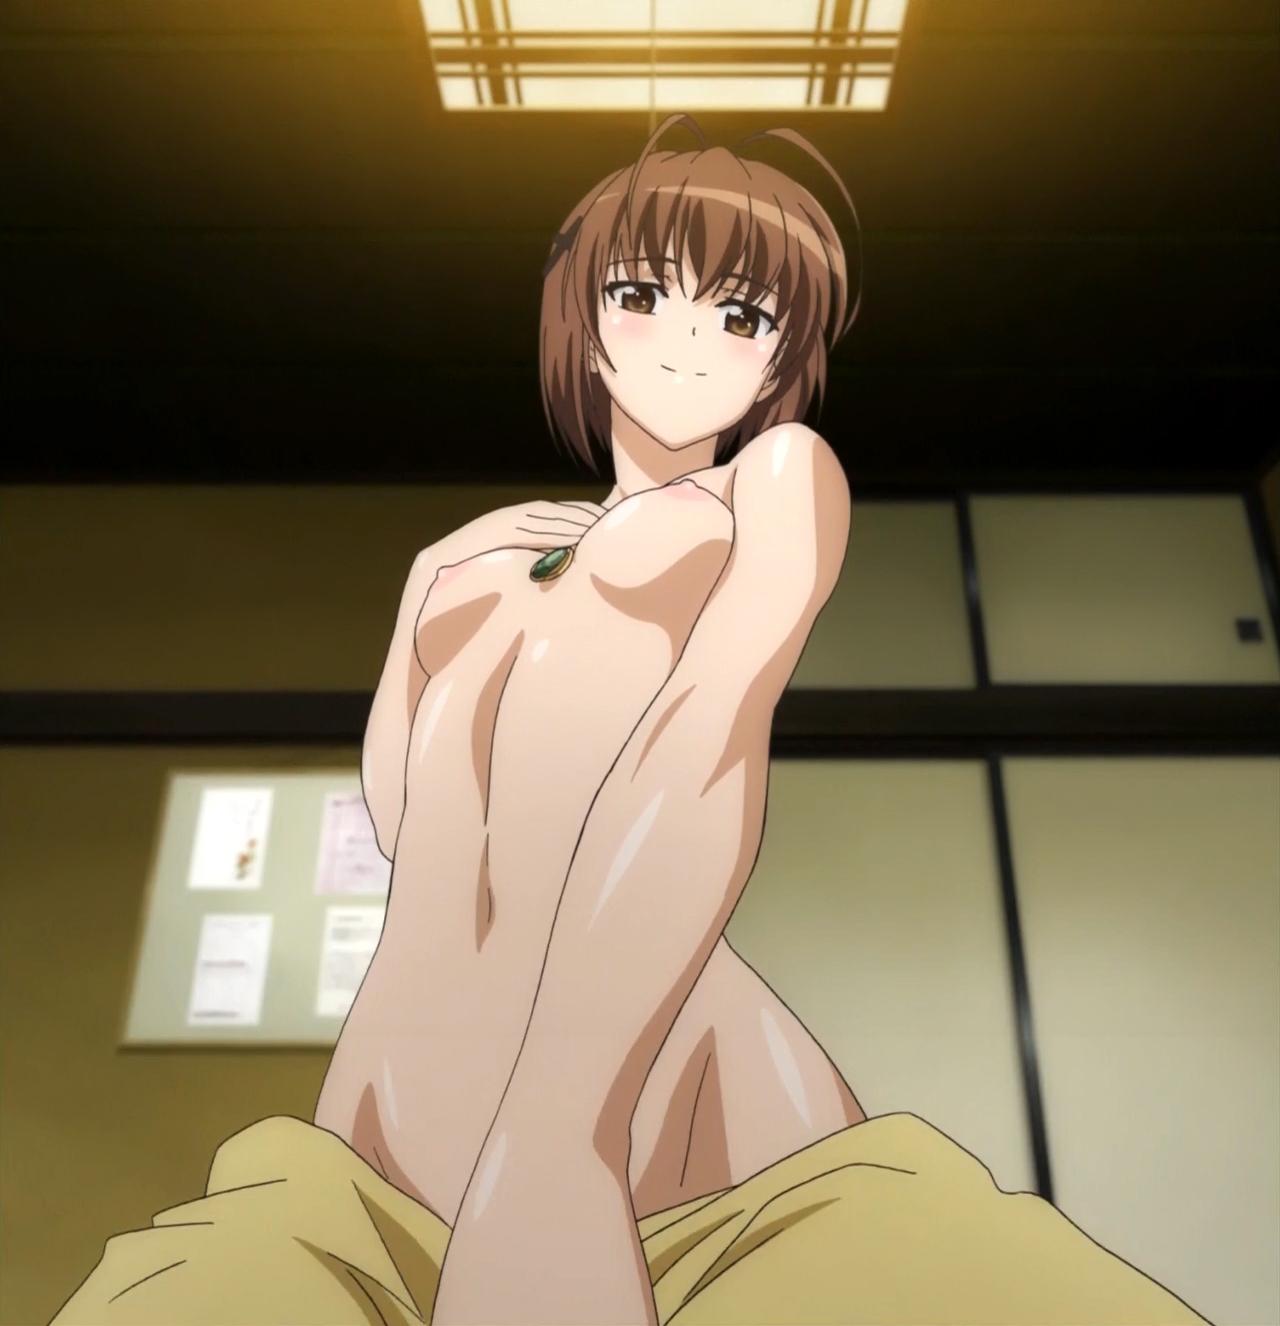 Hentai elfen lied video sexe naked image